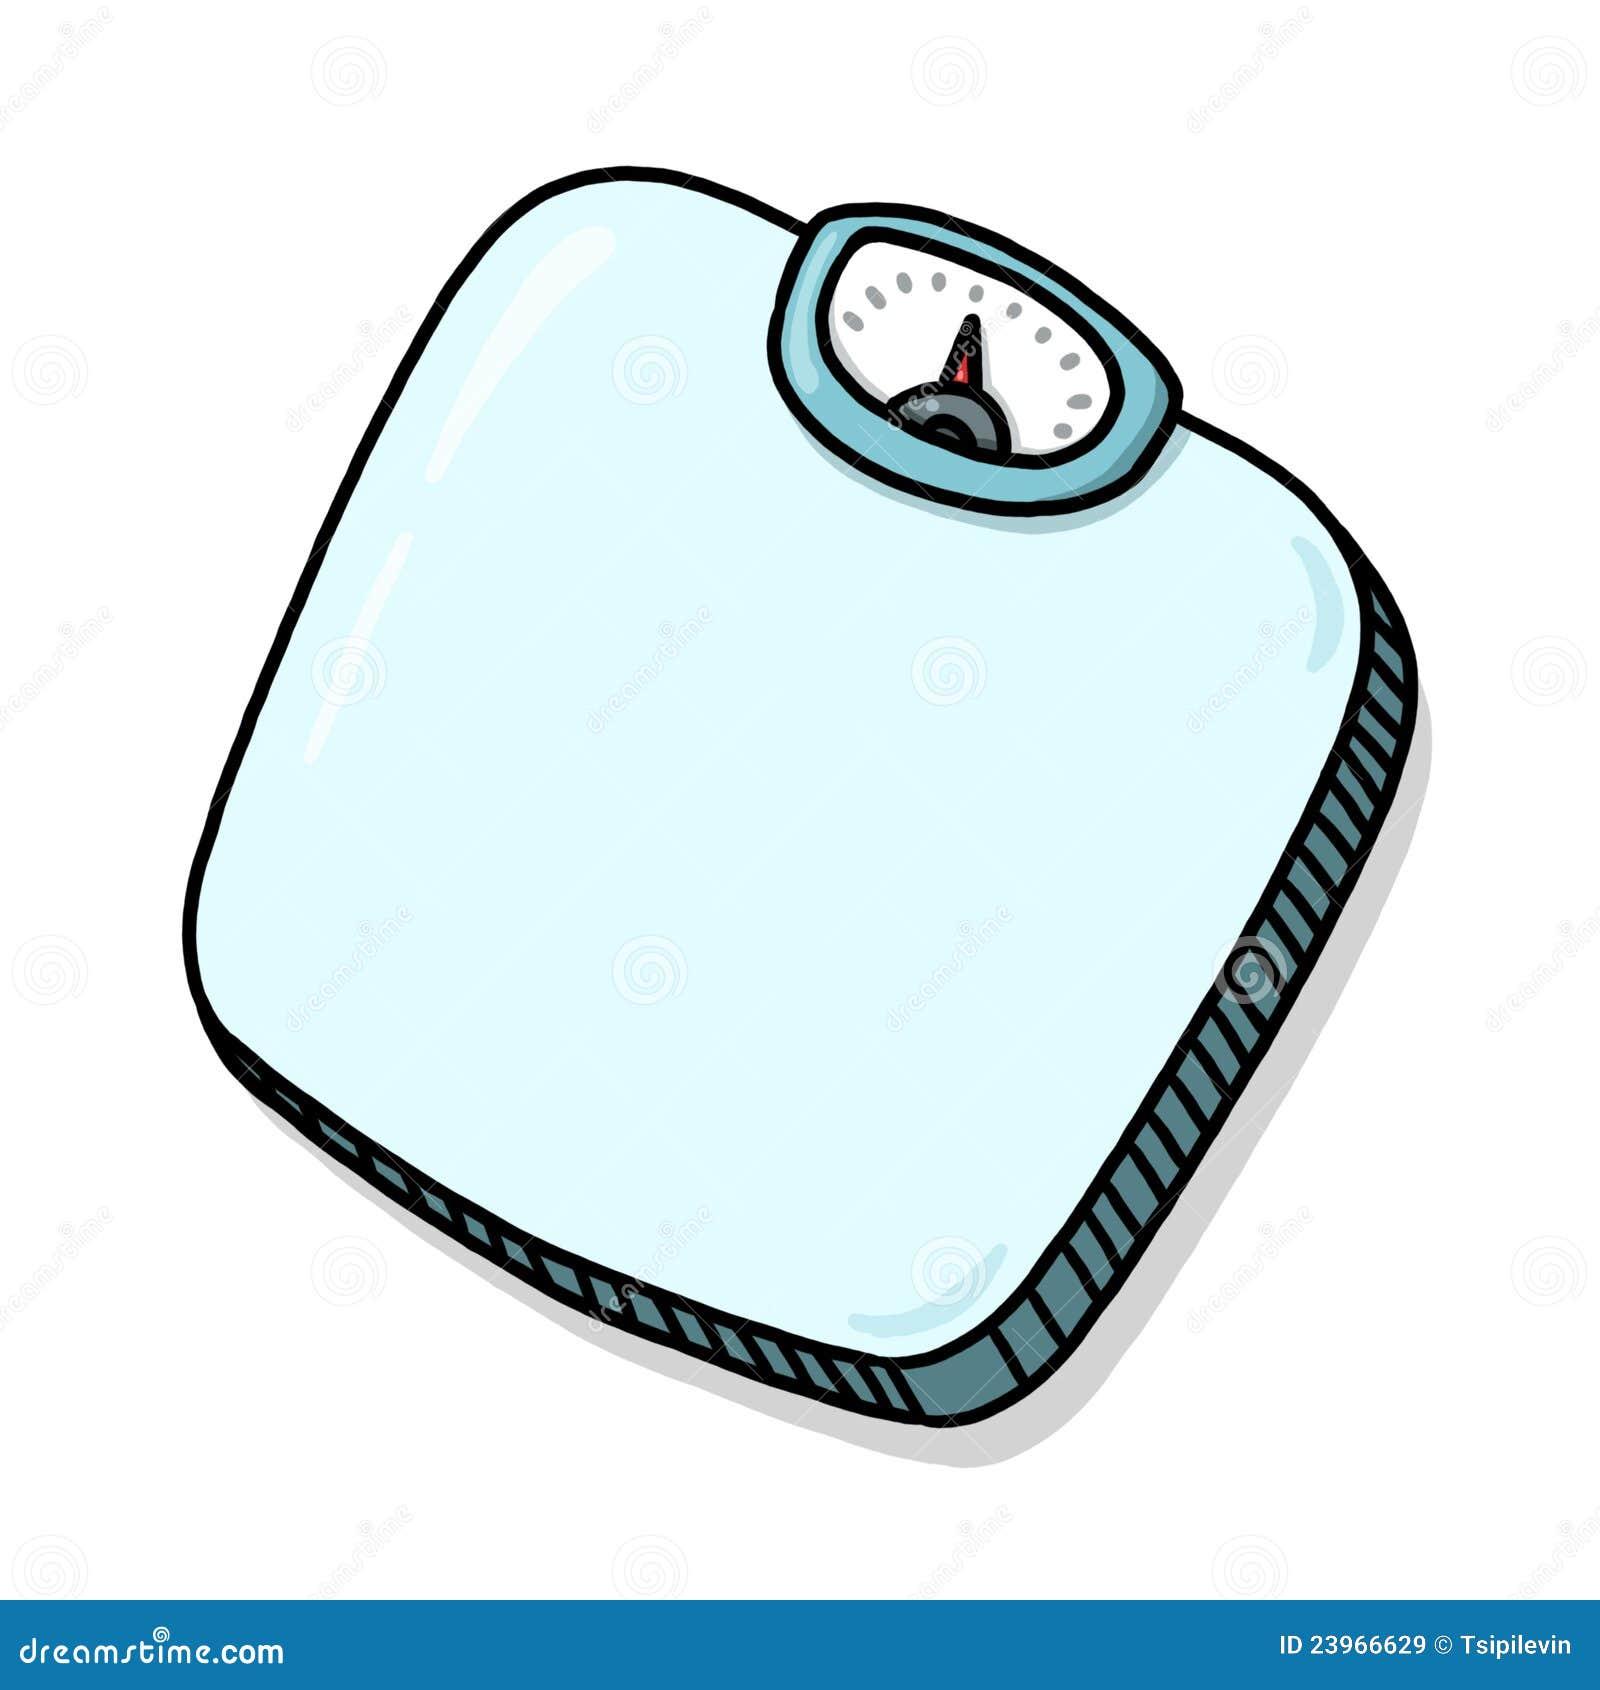 Cartoon Pictures Of Weight Scales | cartoon.ankaperla.com